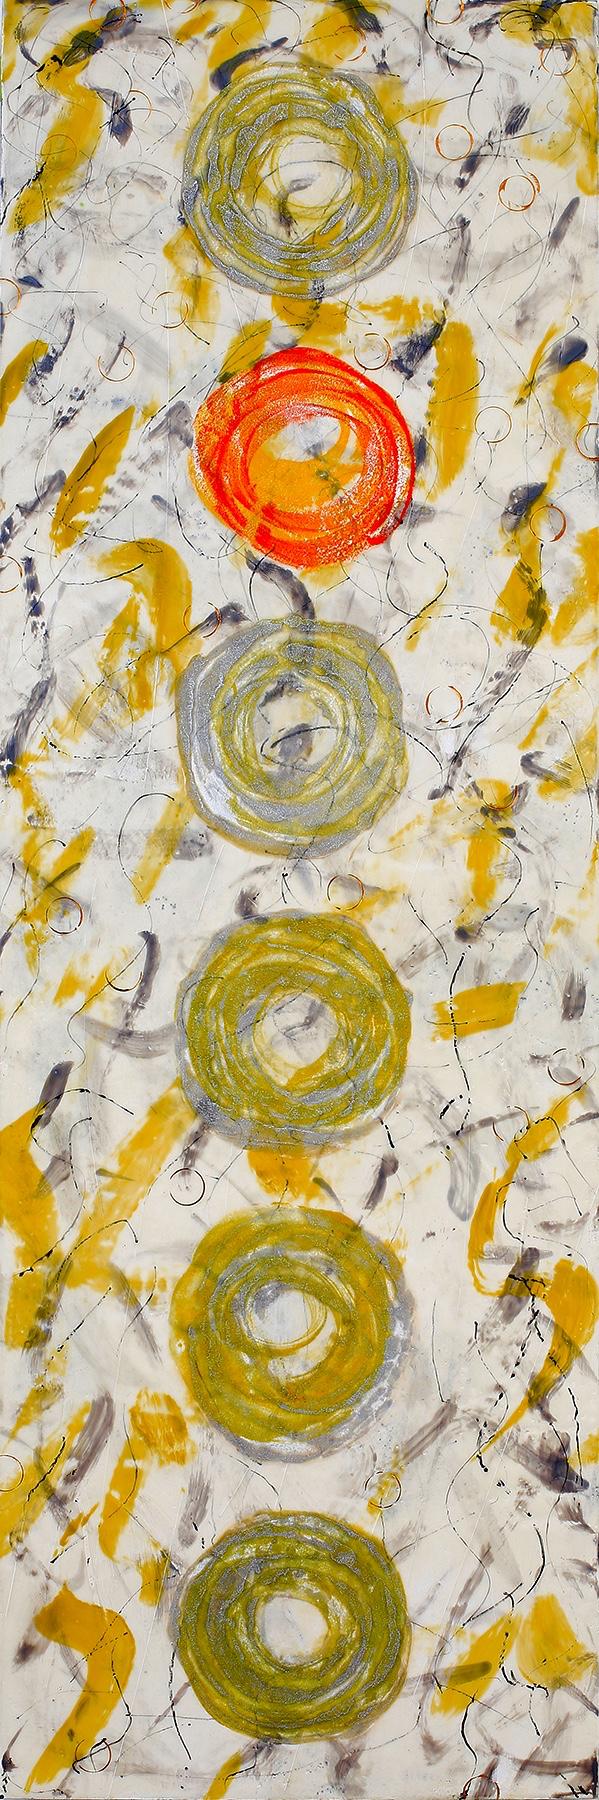 "Non-Conformist encaustic, mixed media, & glass threads,12x36"""